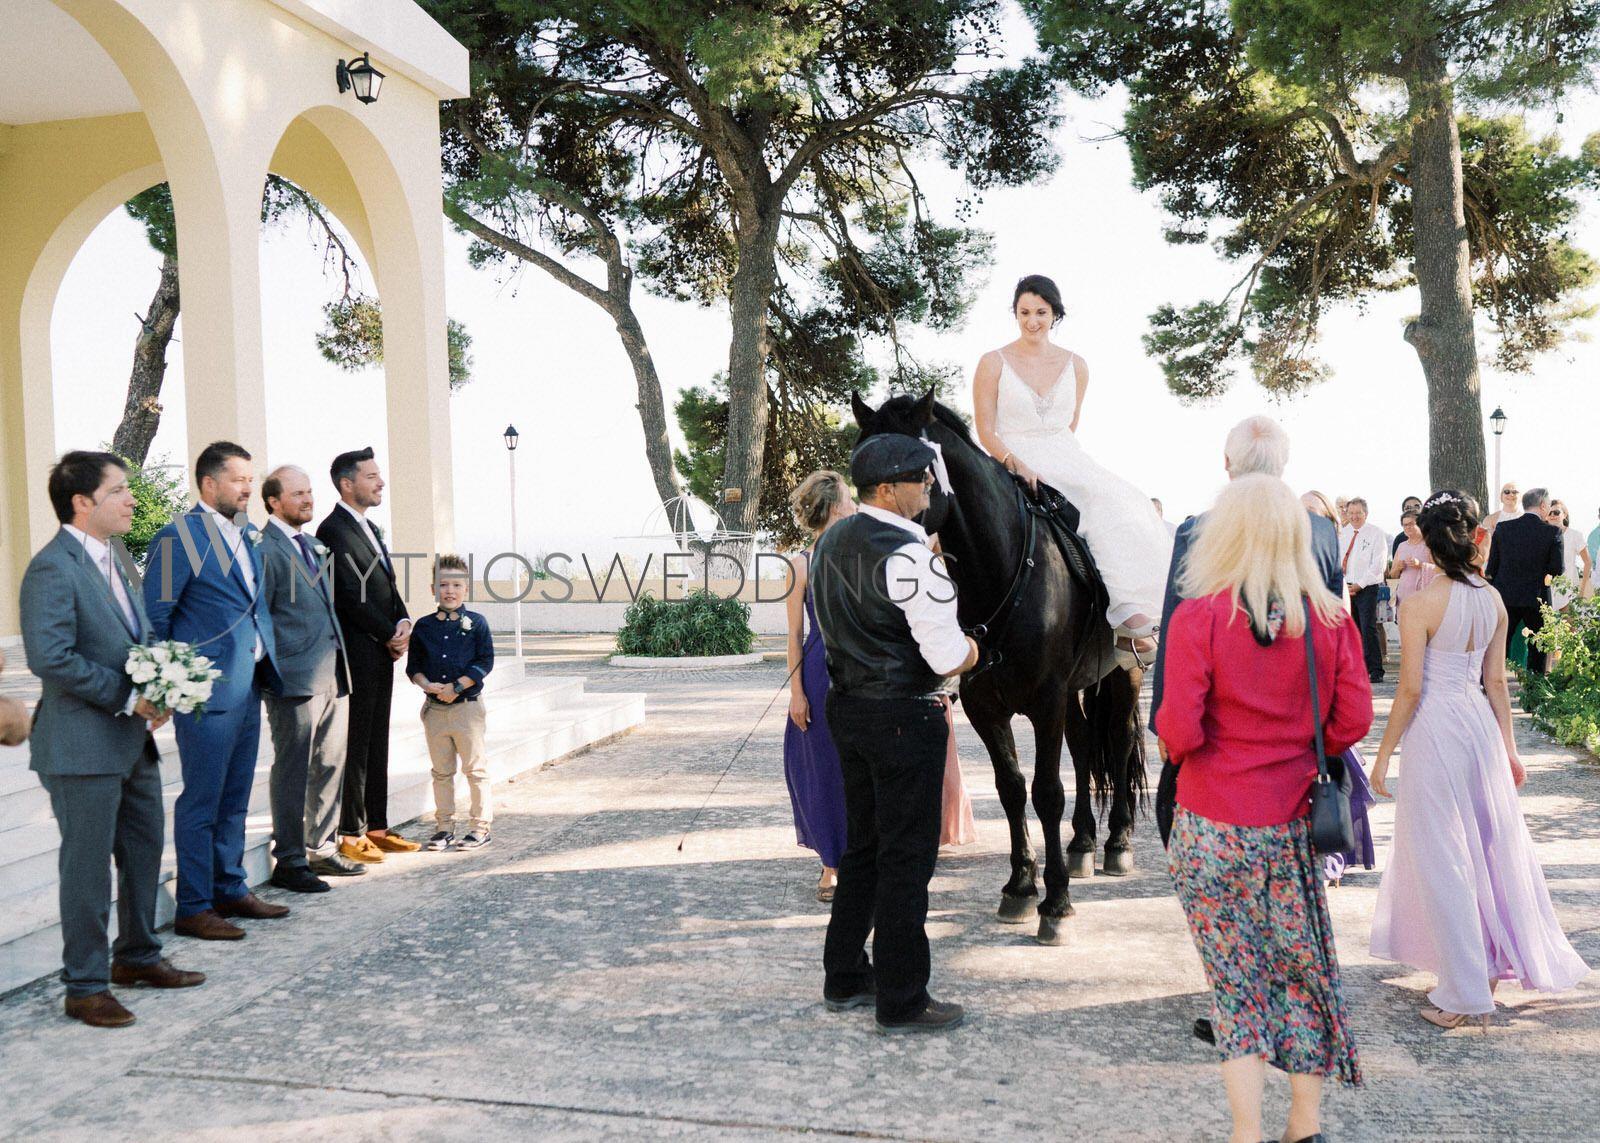 WeddingN+S08.09.18-114